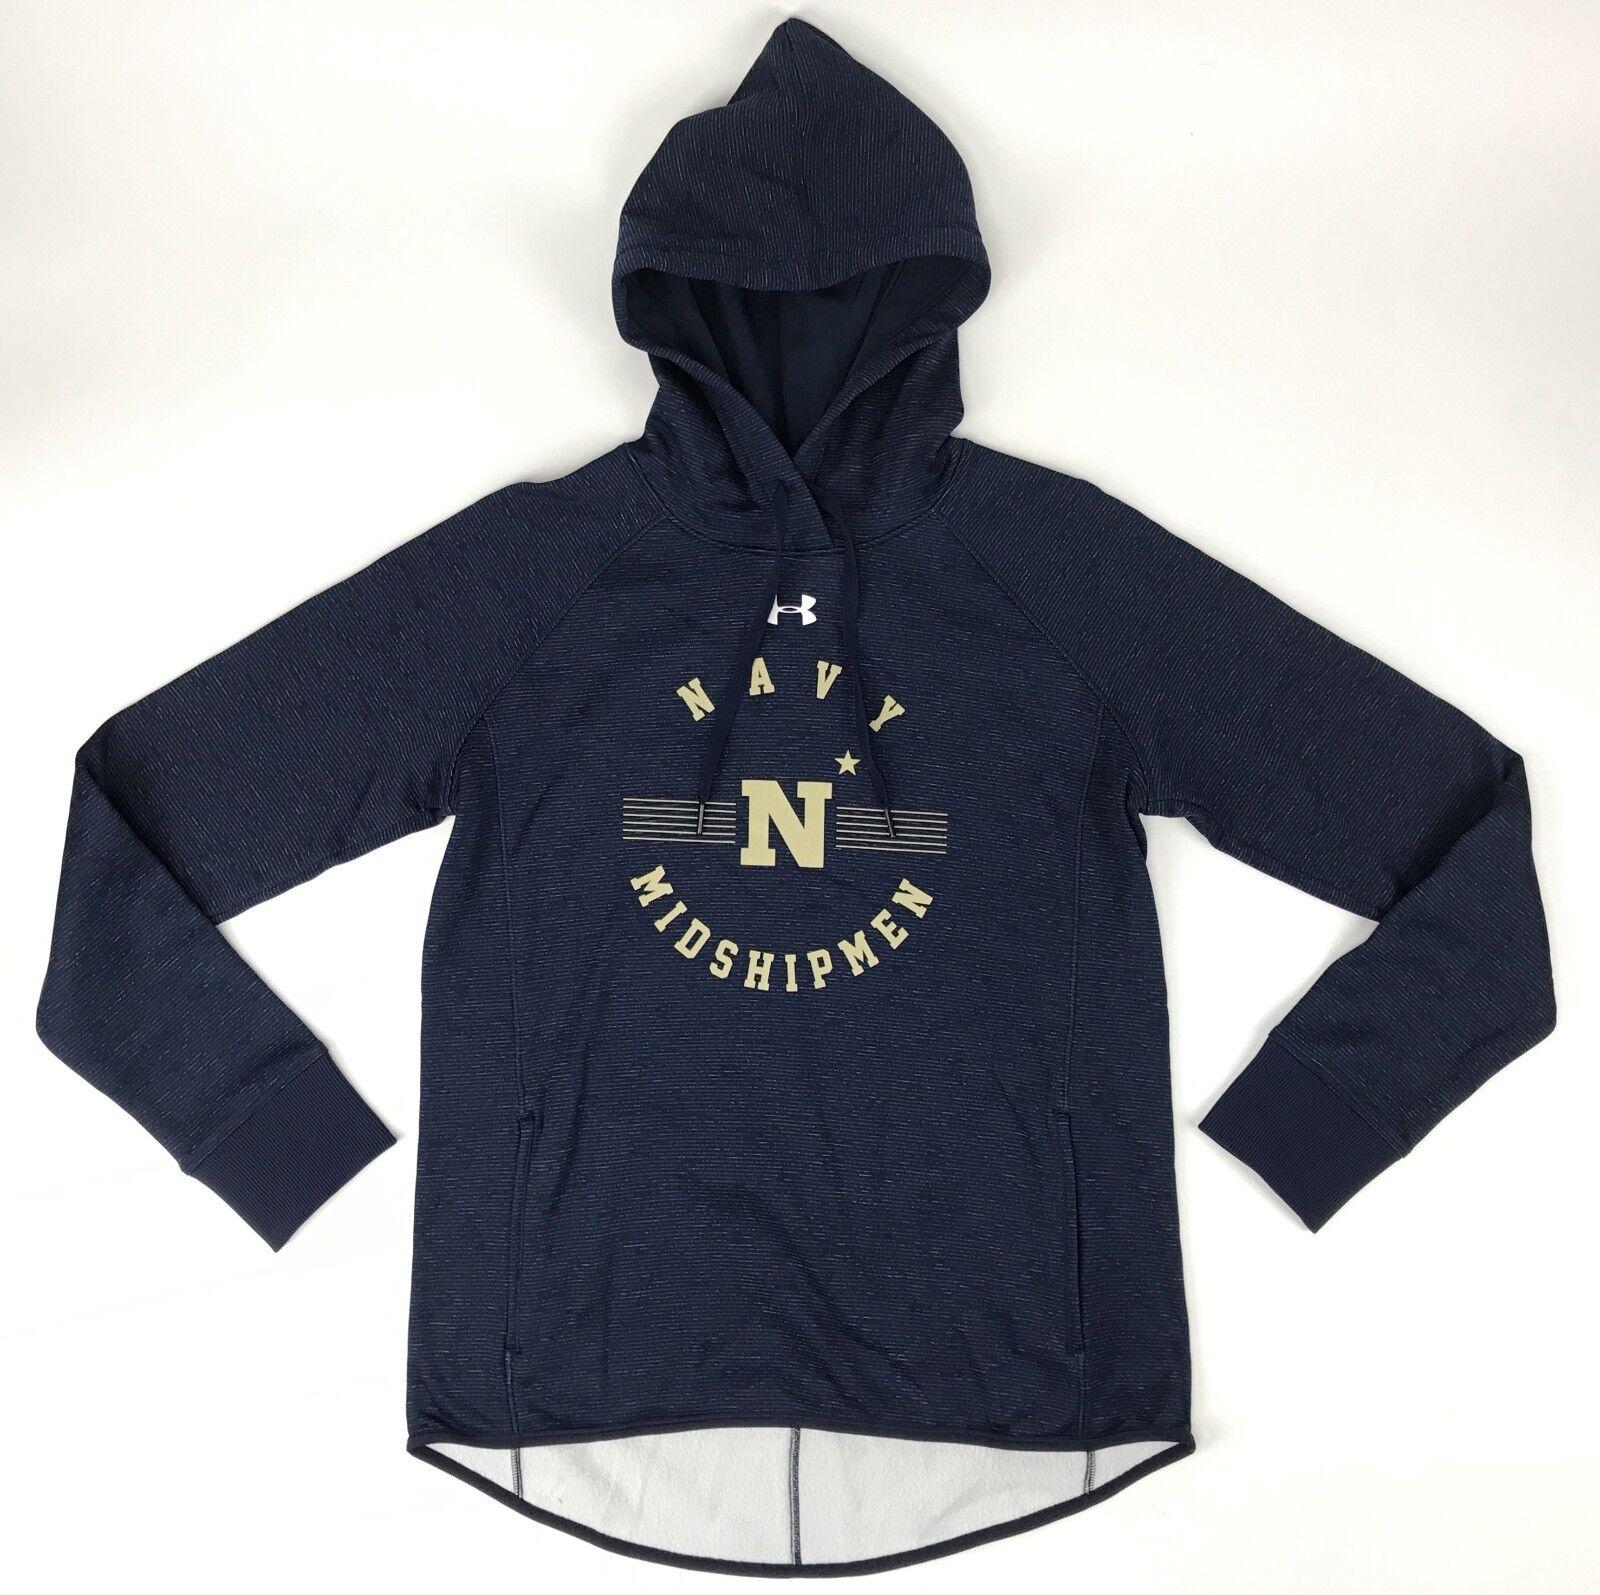 e497df07a005 Details about New Under Armour Women s S Navy Academy Midshipmen Double  Threat Fleece Hoodie